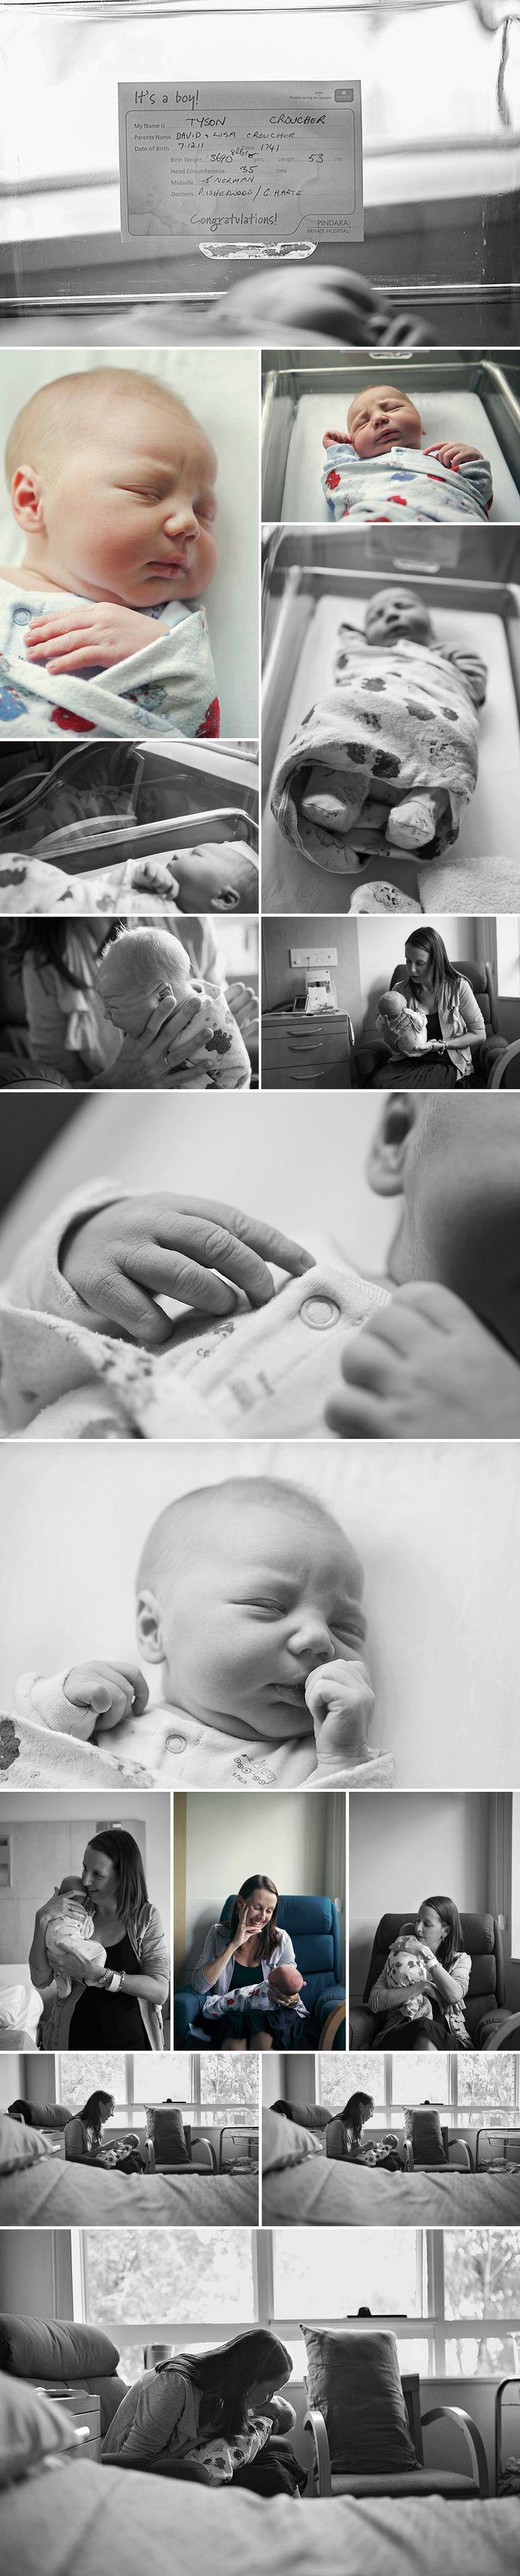 newborn hospital session